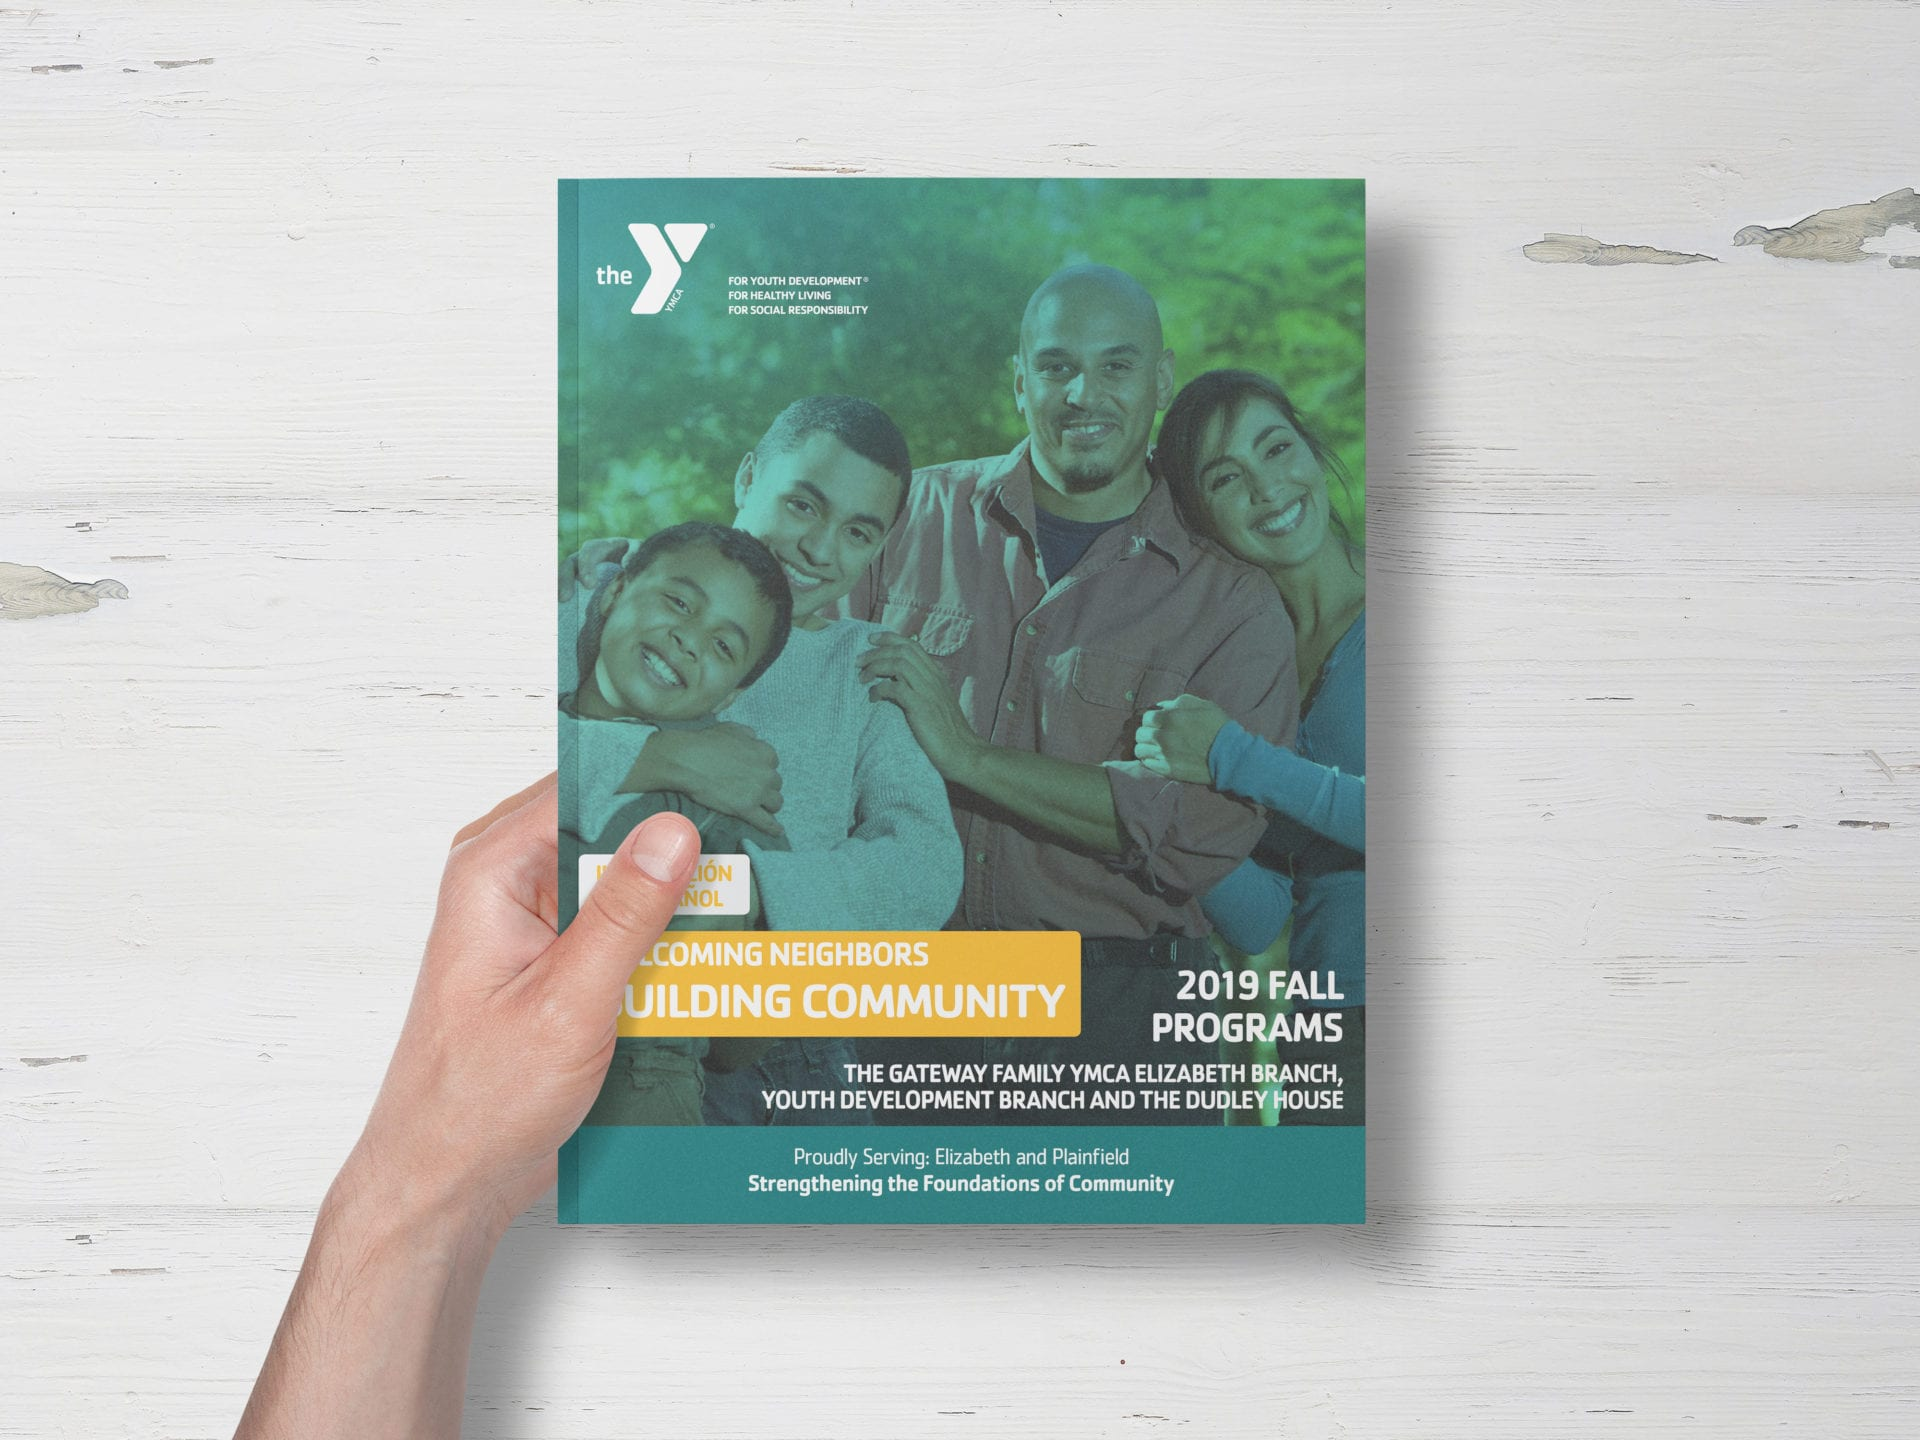 Gateway Family Program Guides